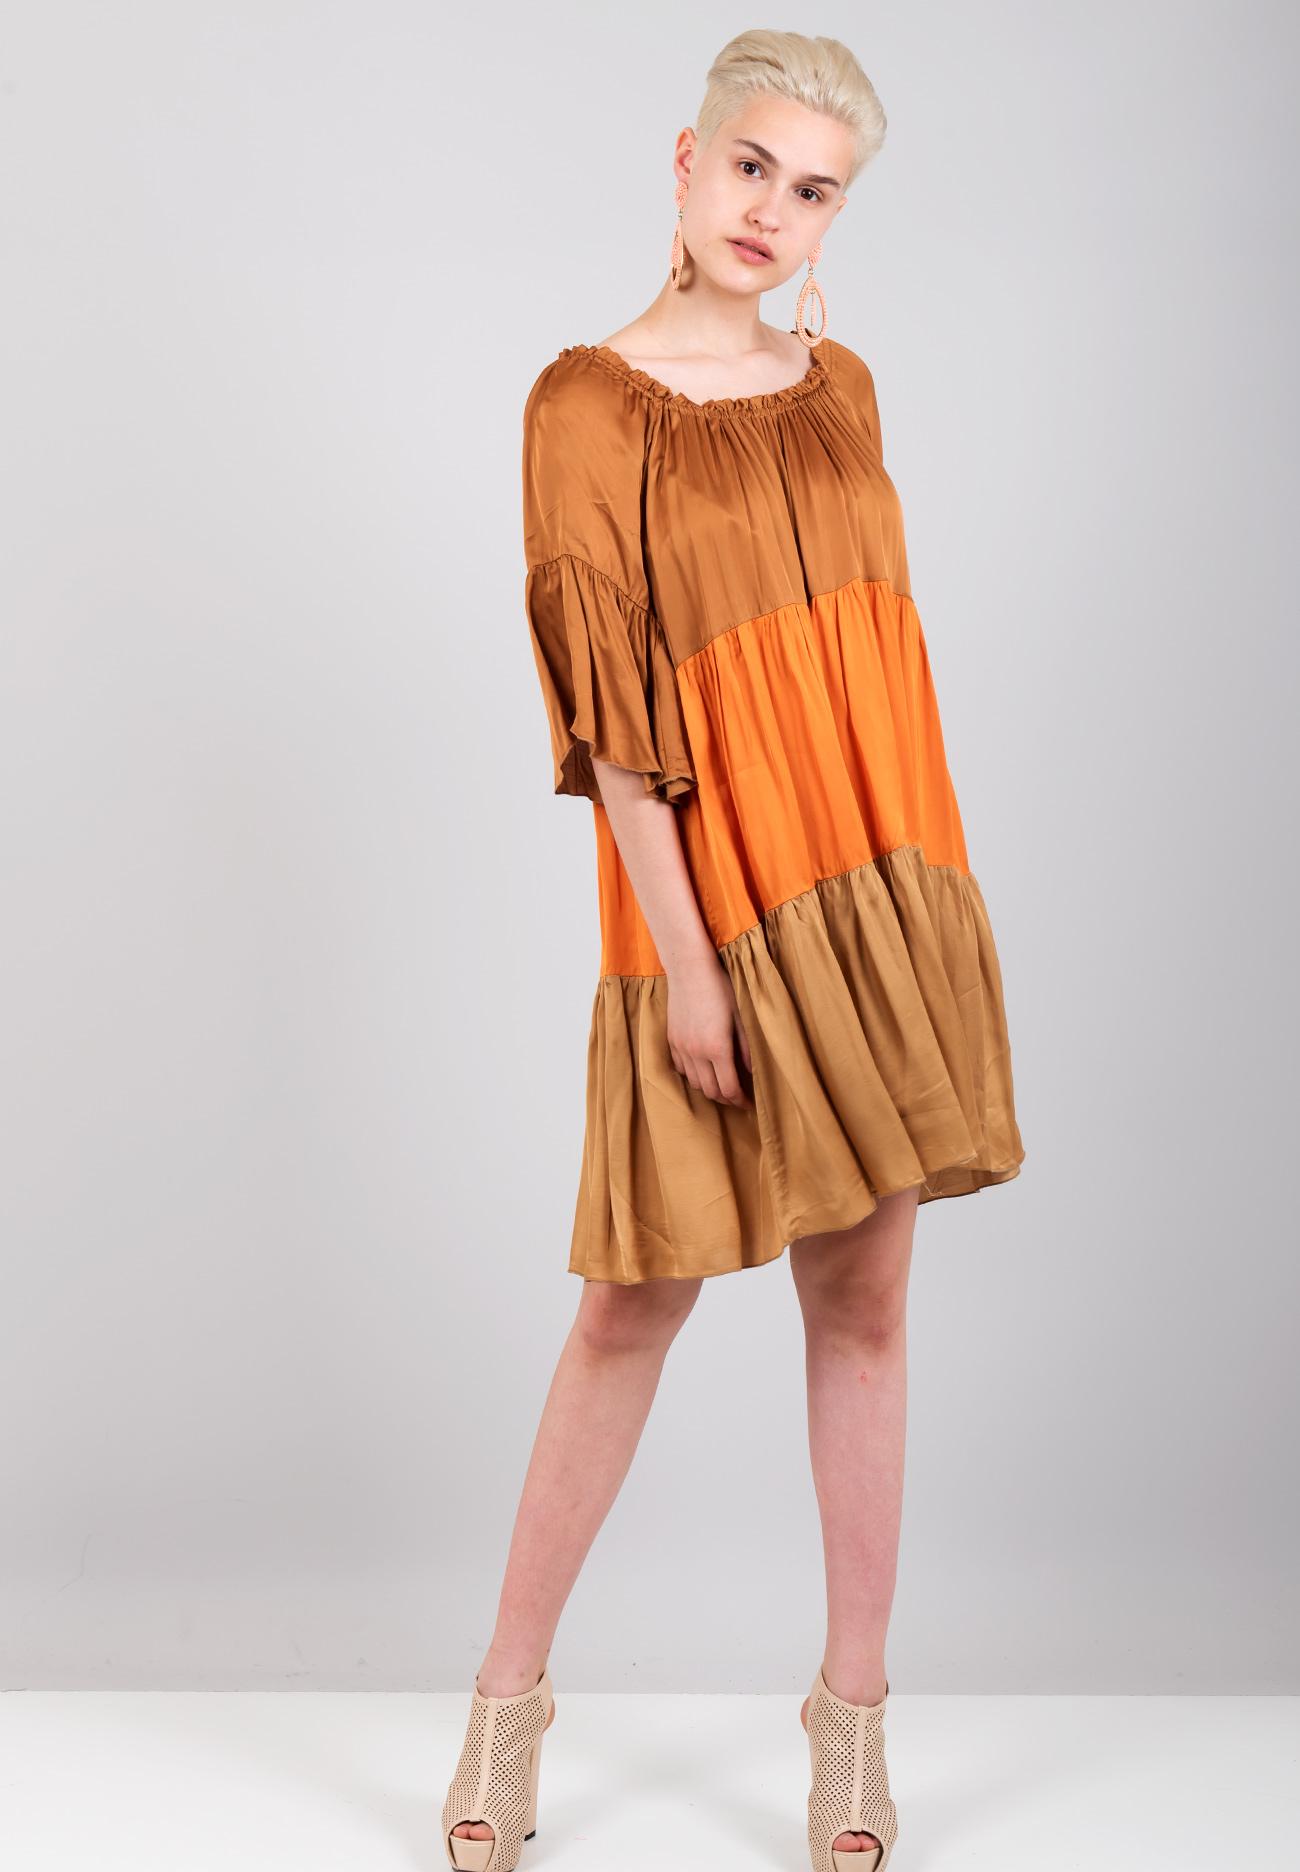 76ab35eb29ad Σατέν φόρεμα σε αντίθεση - ZIC ZAC